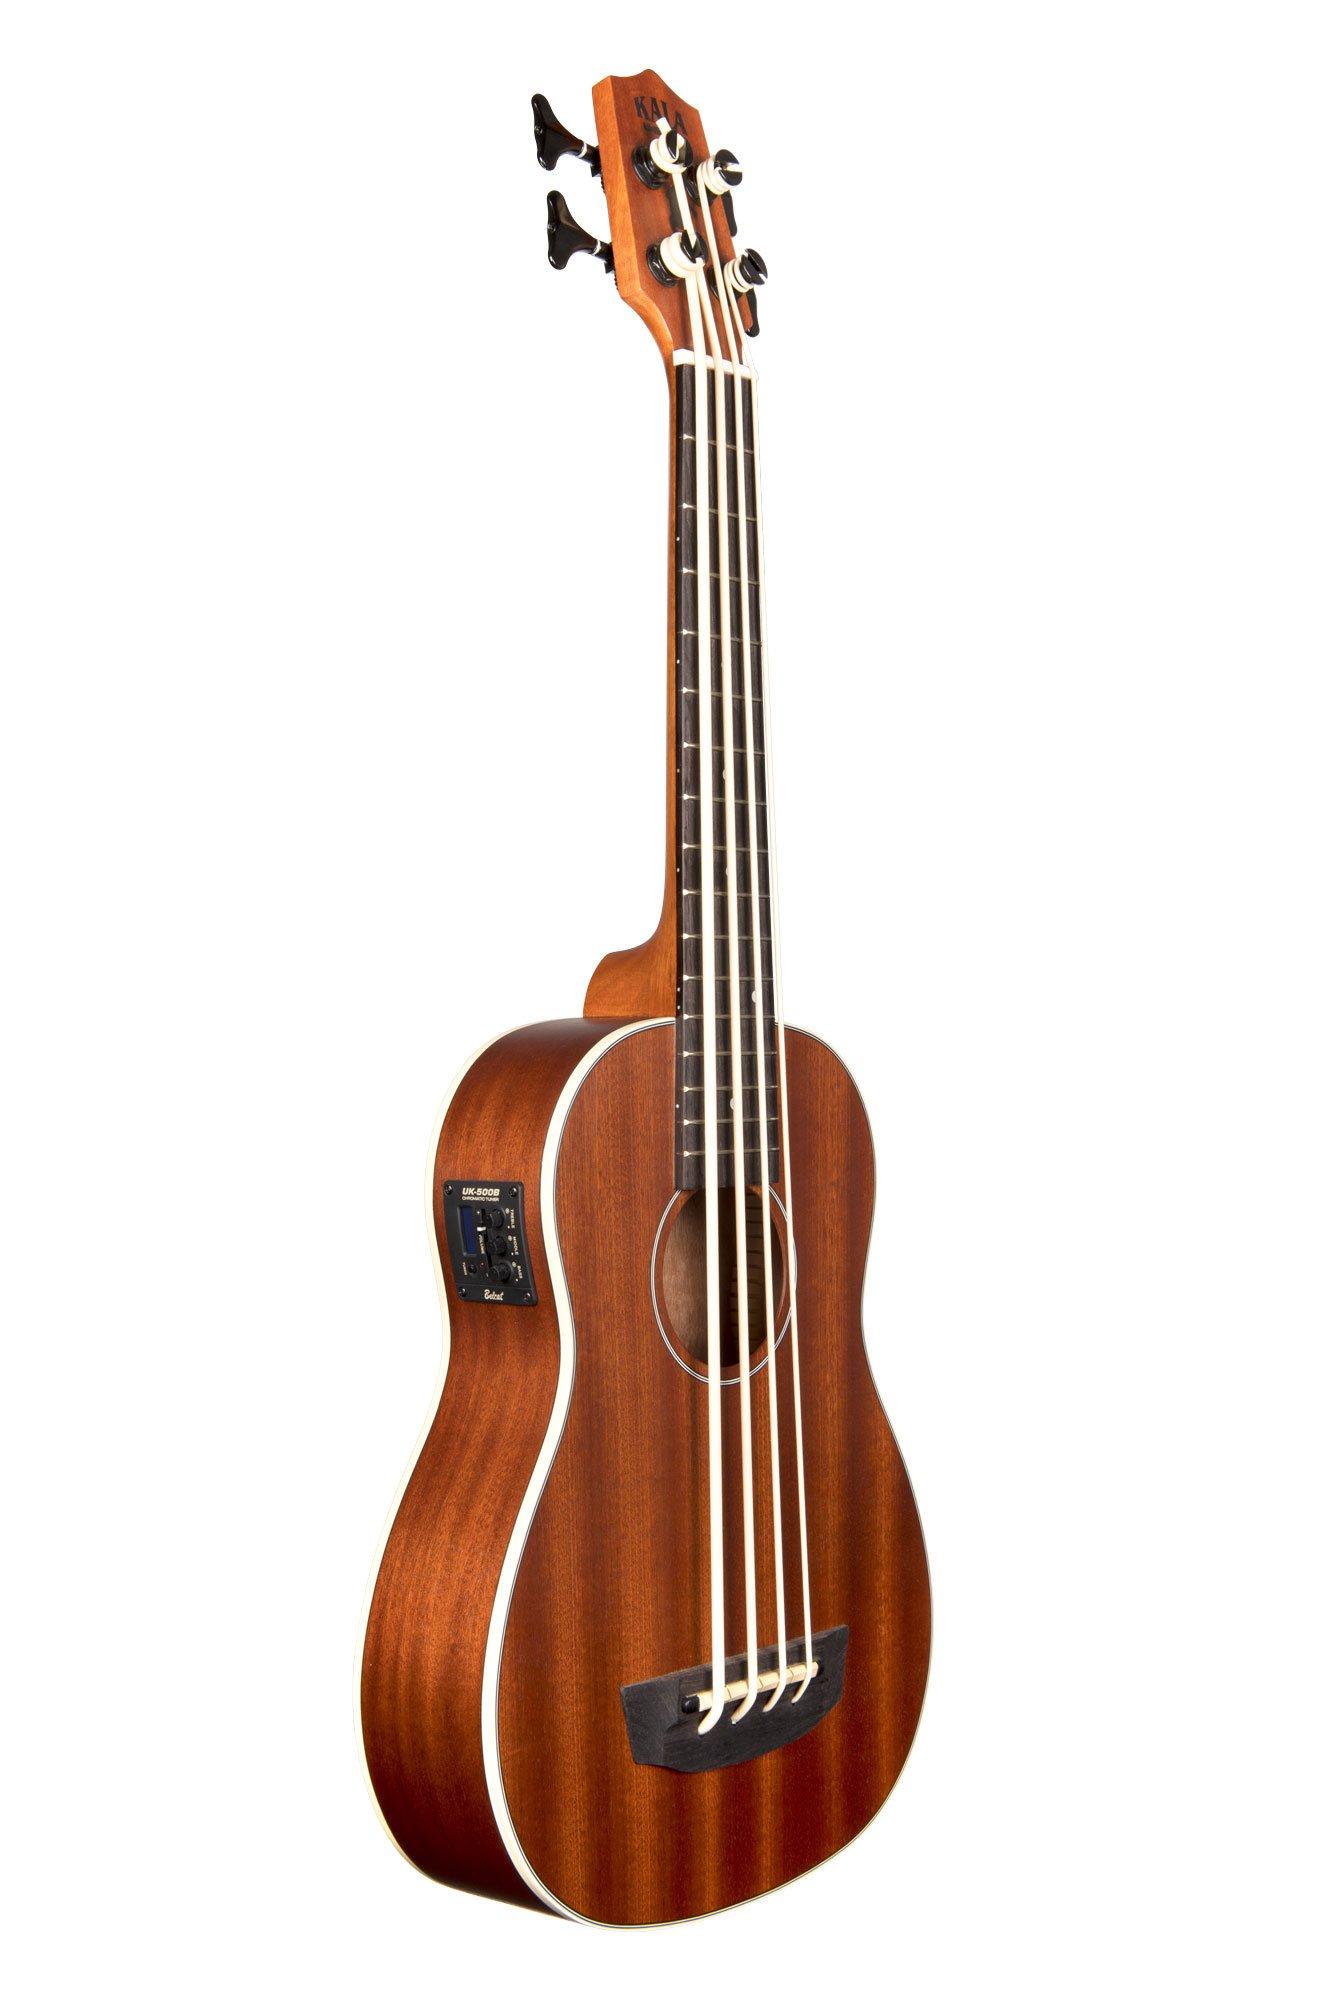 Kala U-Bass-PSGR-FS Passenger Acoustic-Electric U-Bass Ukulele Bundle with Gig Bag, Tuner, Austin Bazaar Instructional DVD, and Polishing Cloth by Kala (Image #3)